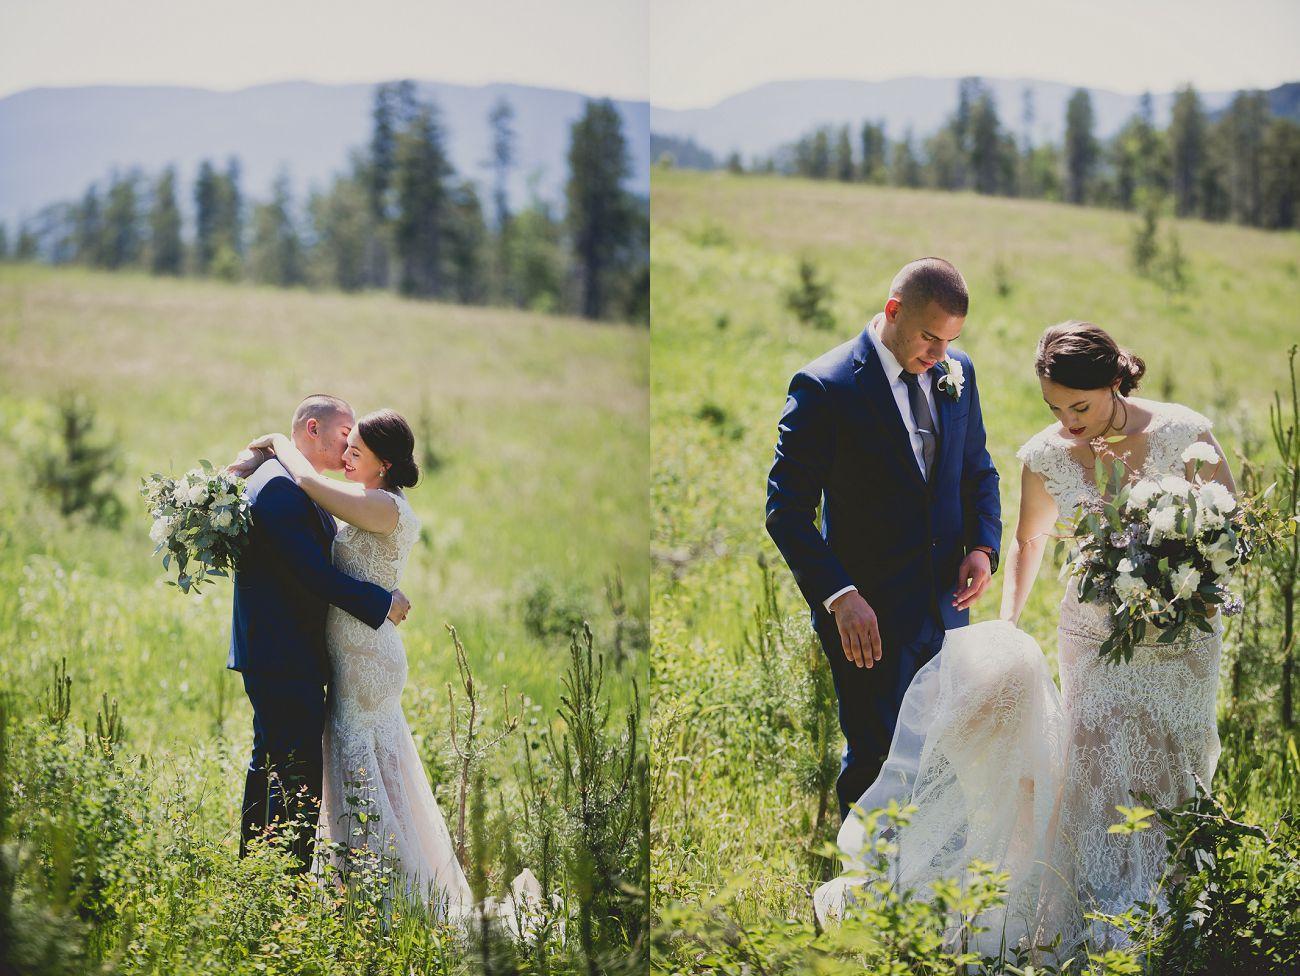 Jennifer_Mooney_Photo_Glacier_Park_Weddings_Elopement_00041.jpg